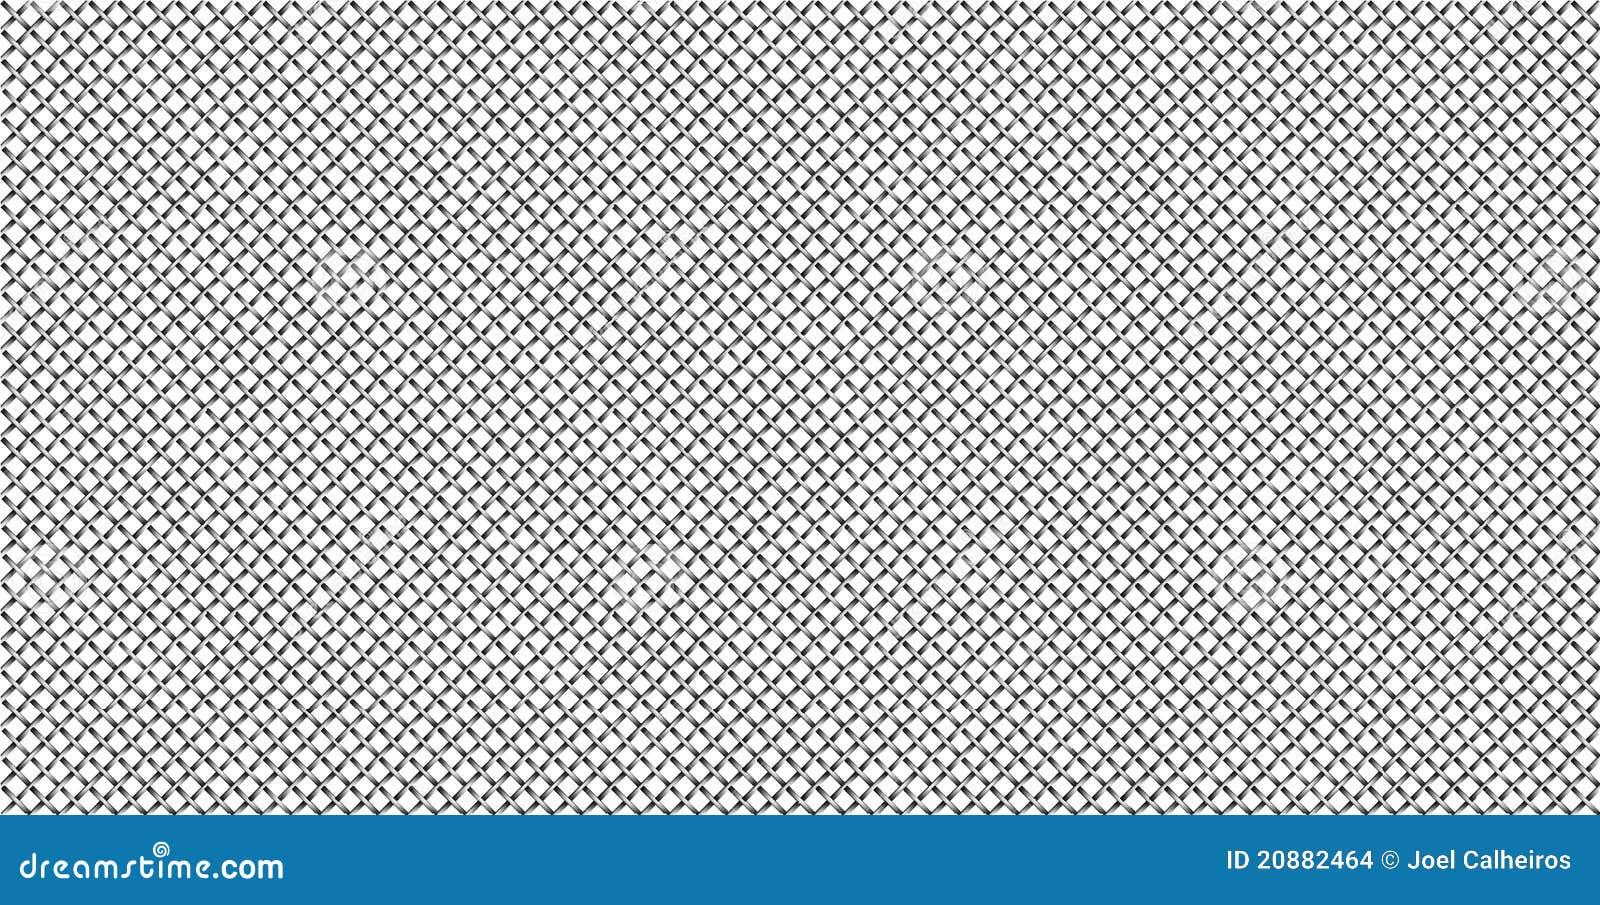 Metal Net Seamless Stock Images Image 20882464